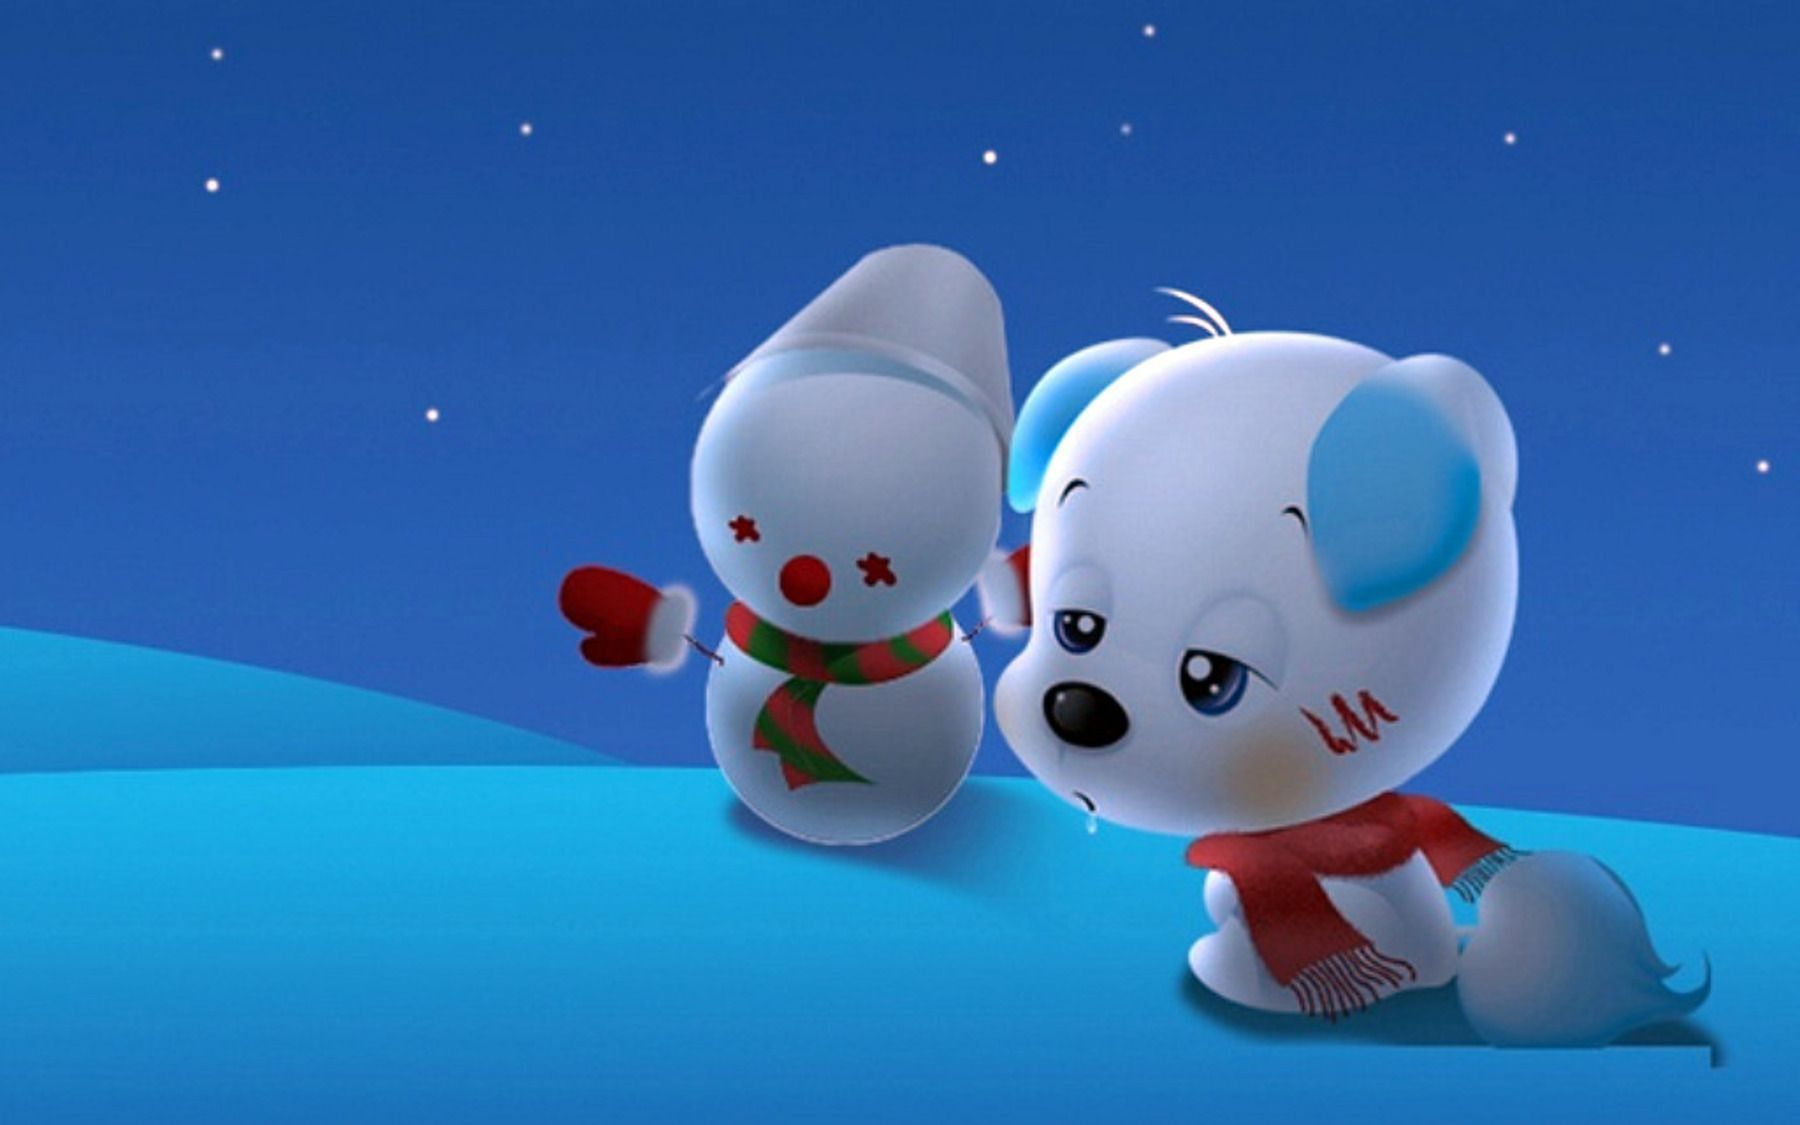 Animated Cartoon Desktop Wallpaper Cute Cartoon Puppy 1800 X 1125 Download Close Cutepuppy3dcarto Cartoon Wallpaper Hd Cartoon Wallpaper Puppy Cartoon